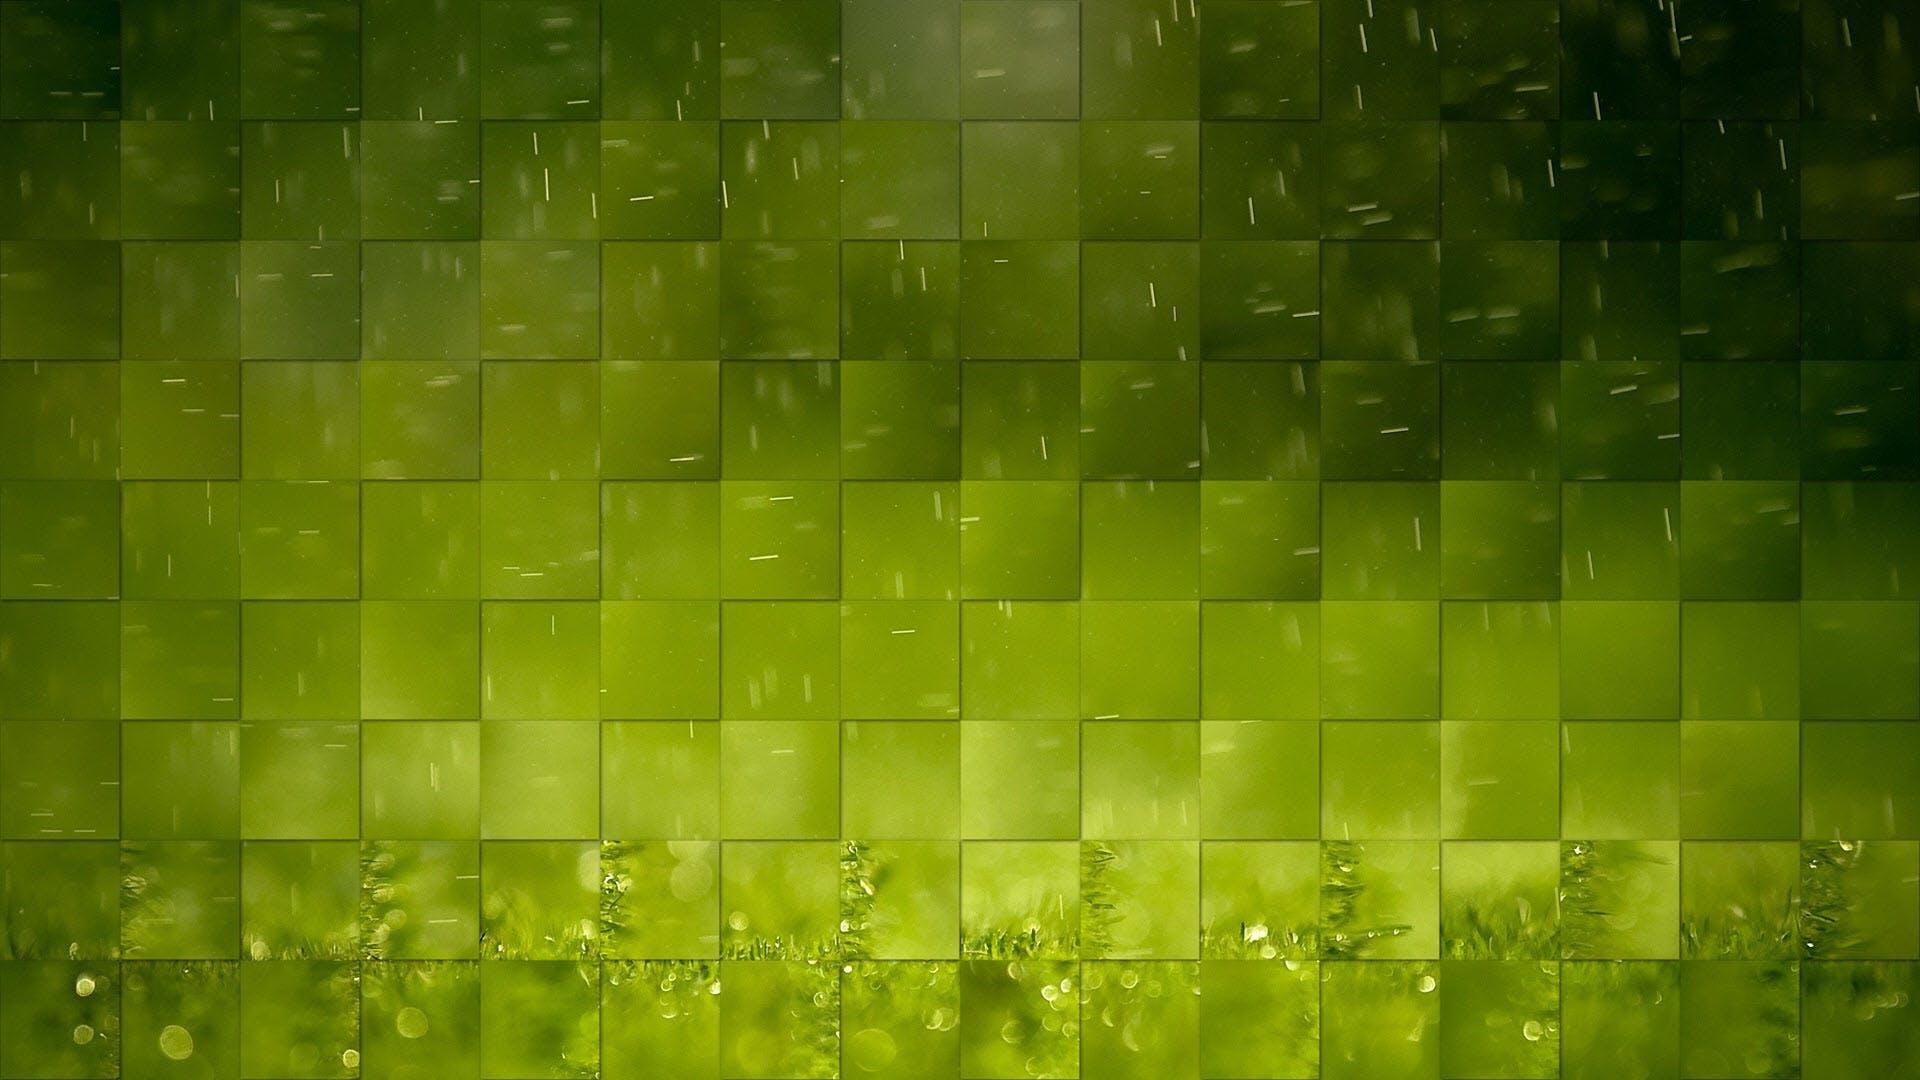 Free stock photo of rain, Generative art, justifyyourlove